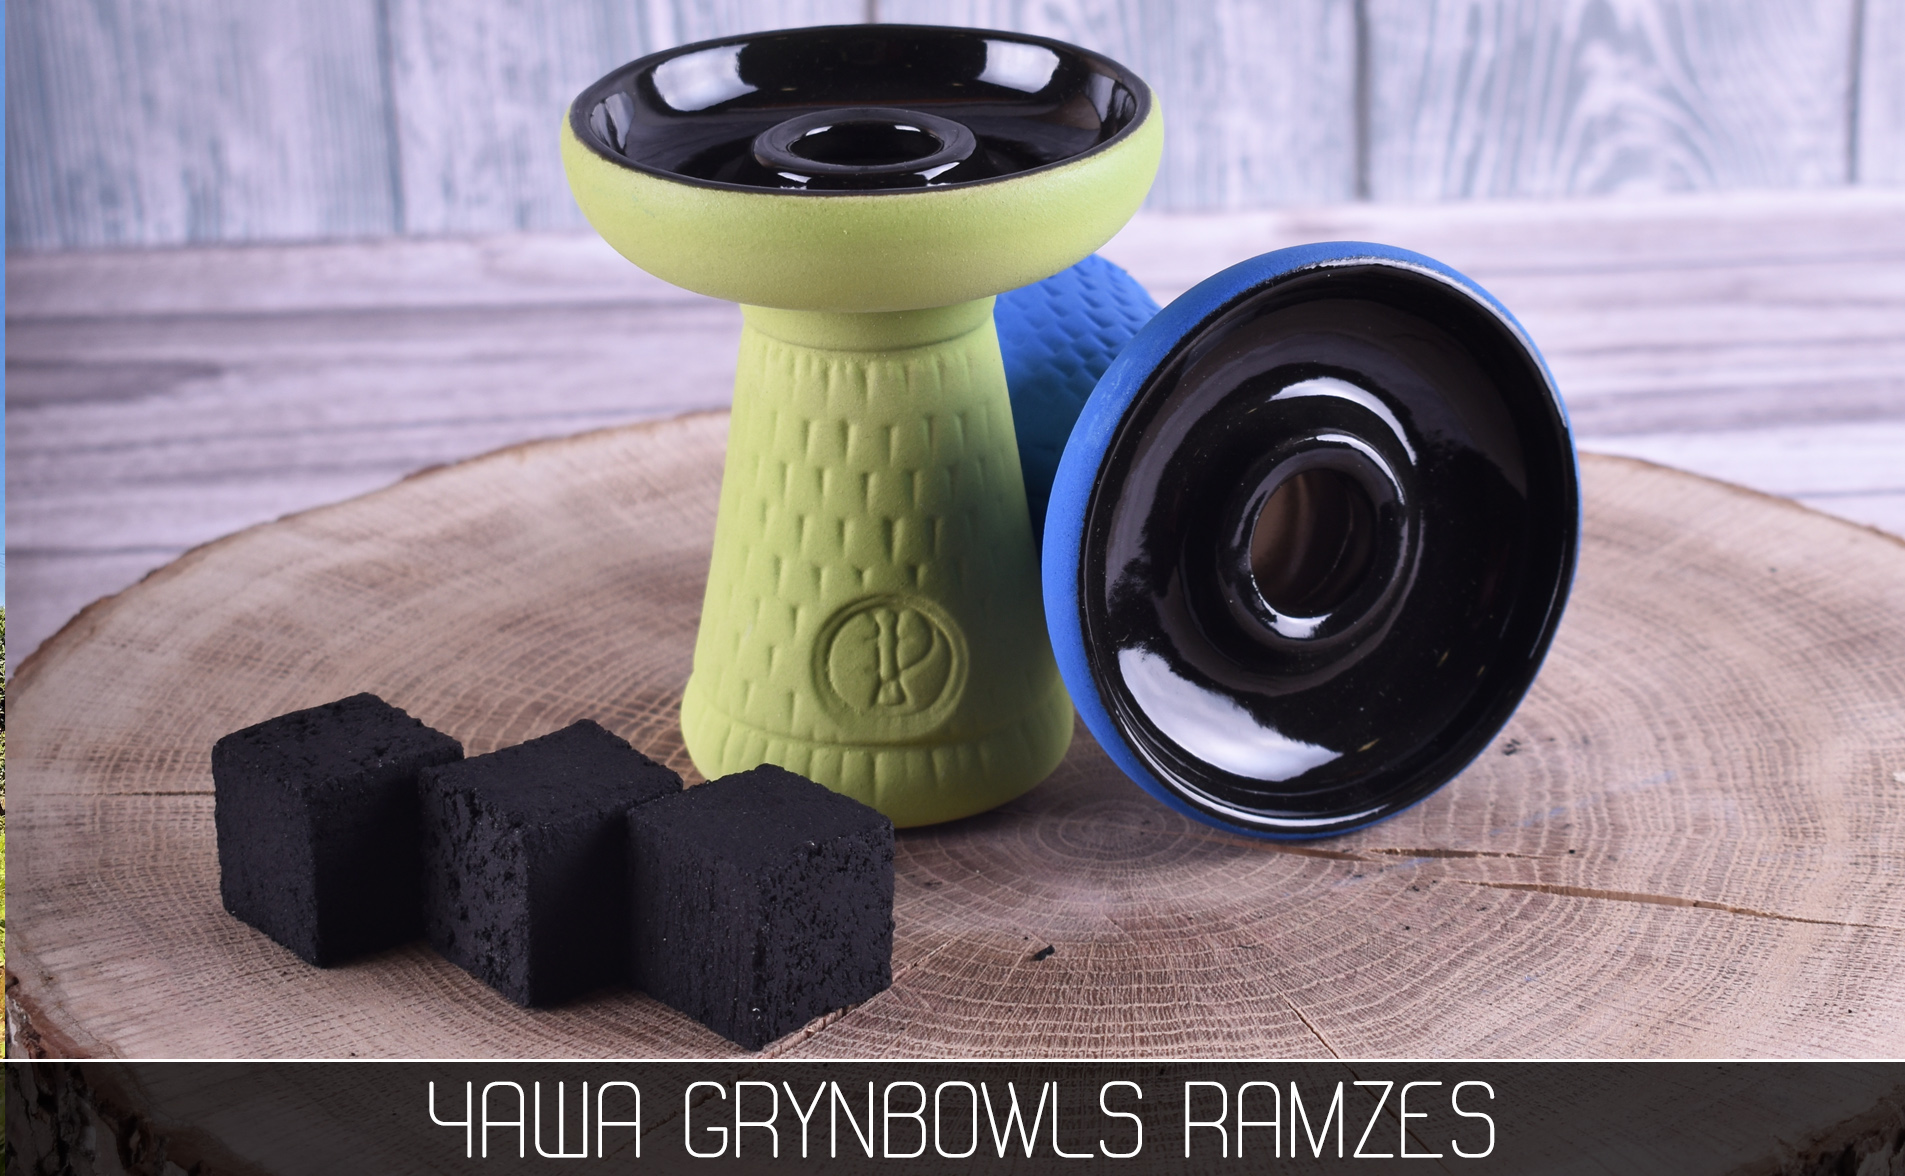 Чаша для кальяна GrynBowls Ramzes - фото 3 - Kalyanchik.ua